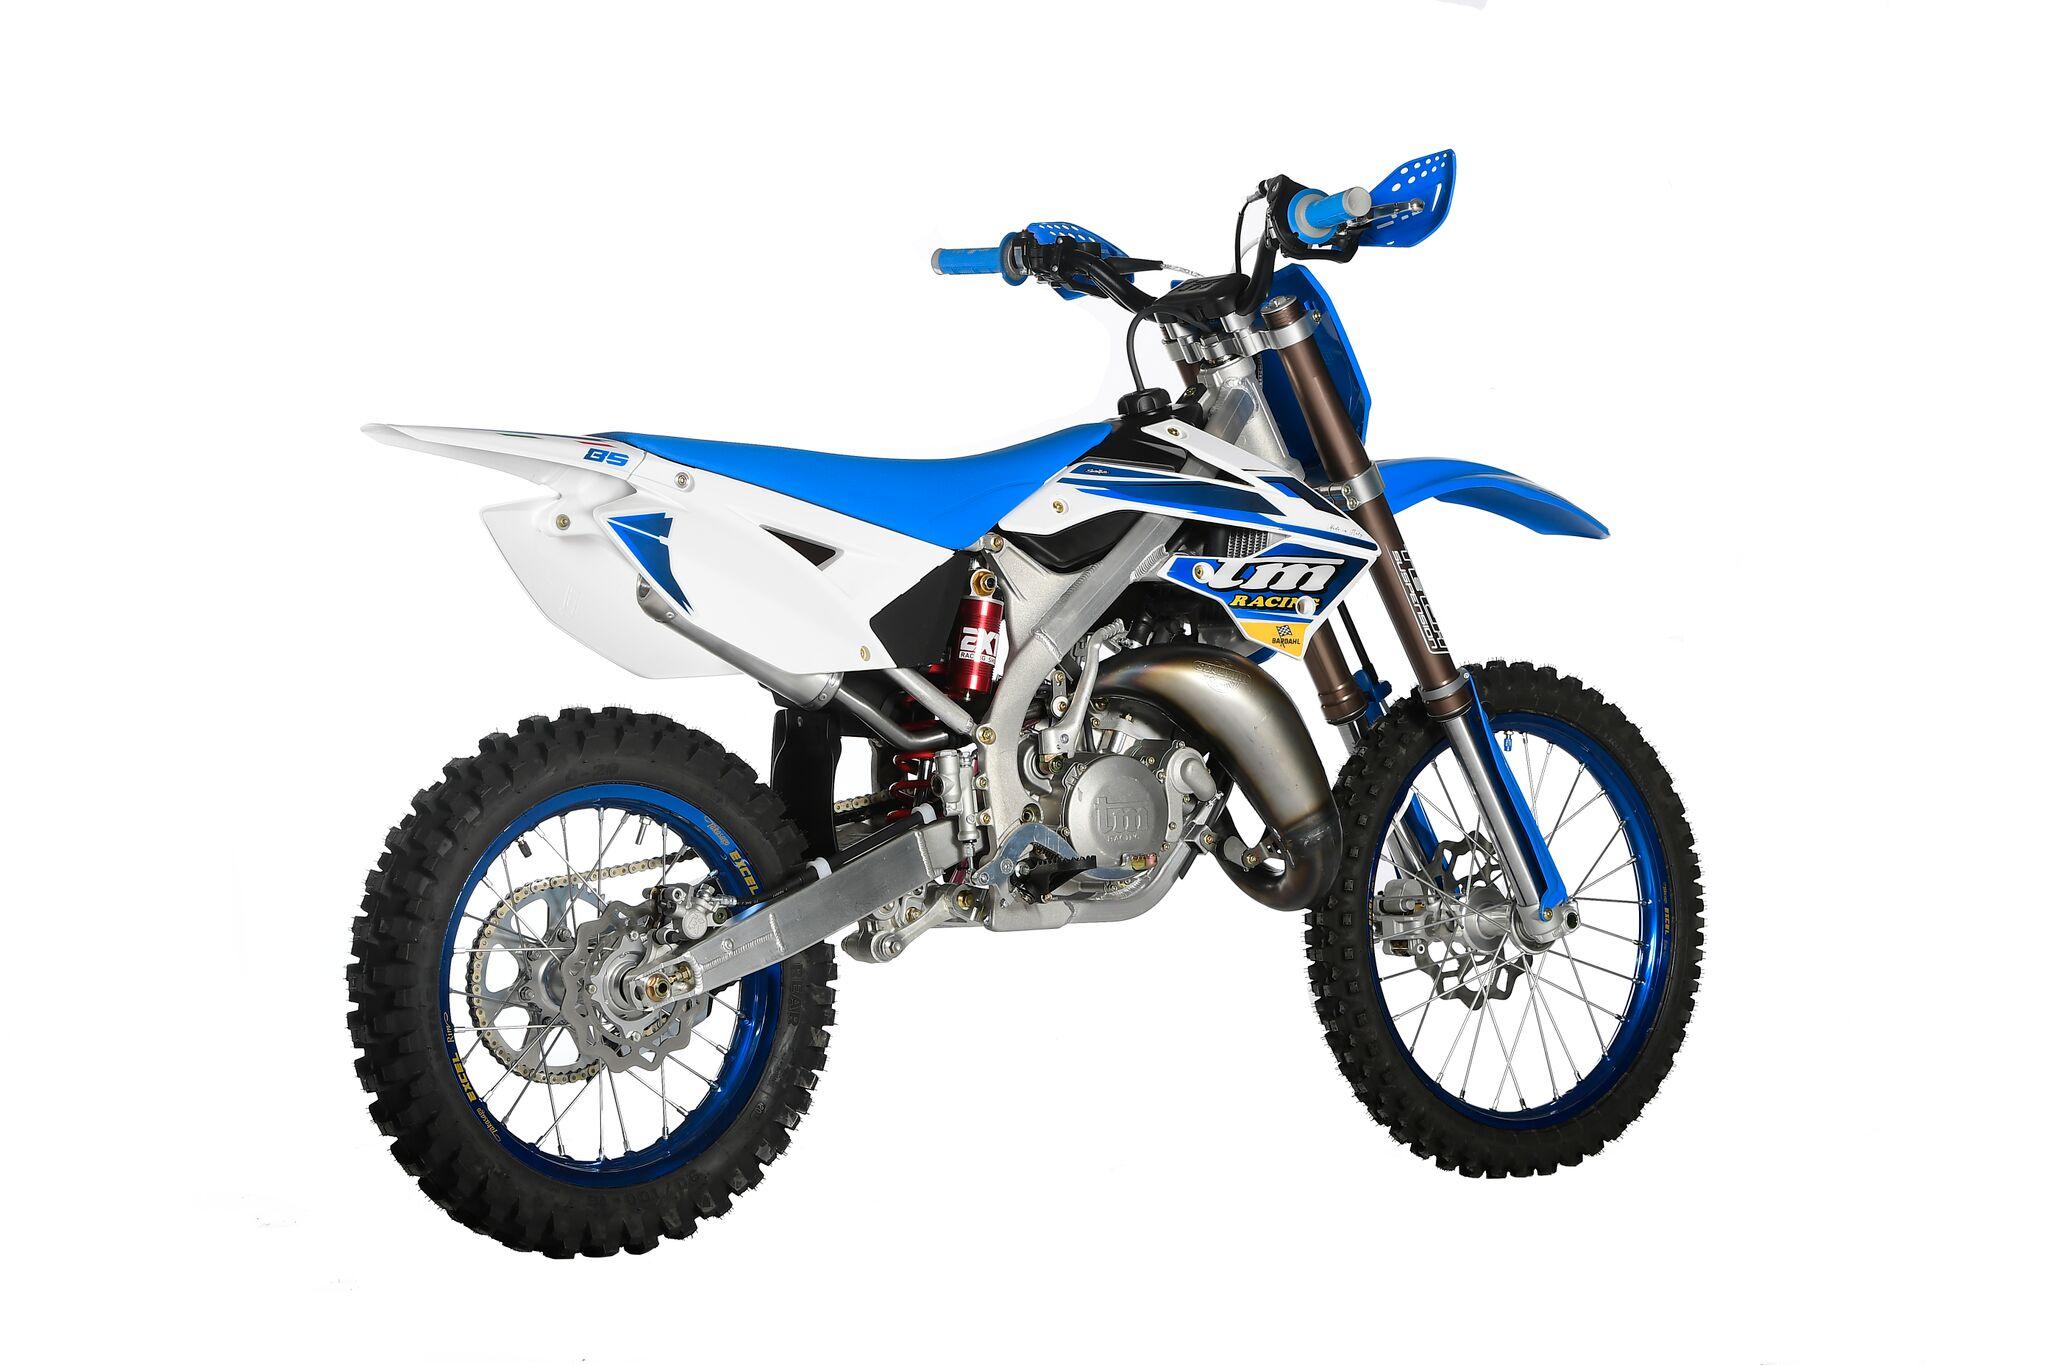 Tm Dirt Bikes >> 2019 Tm Mx 85 Junior For Sale In Fremont Ia Cycle Tech Fremont Ia